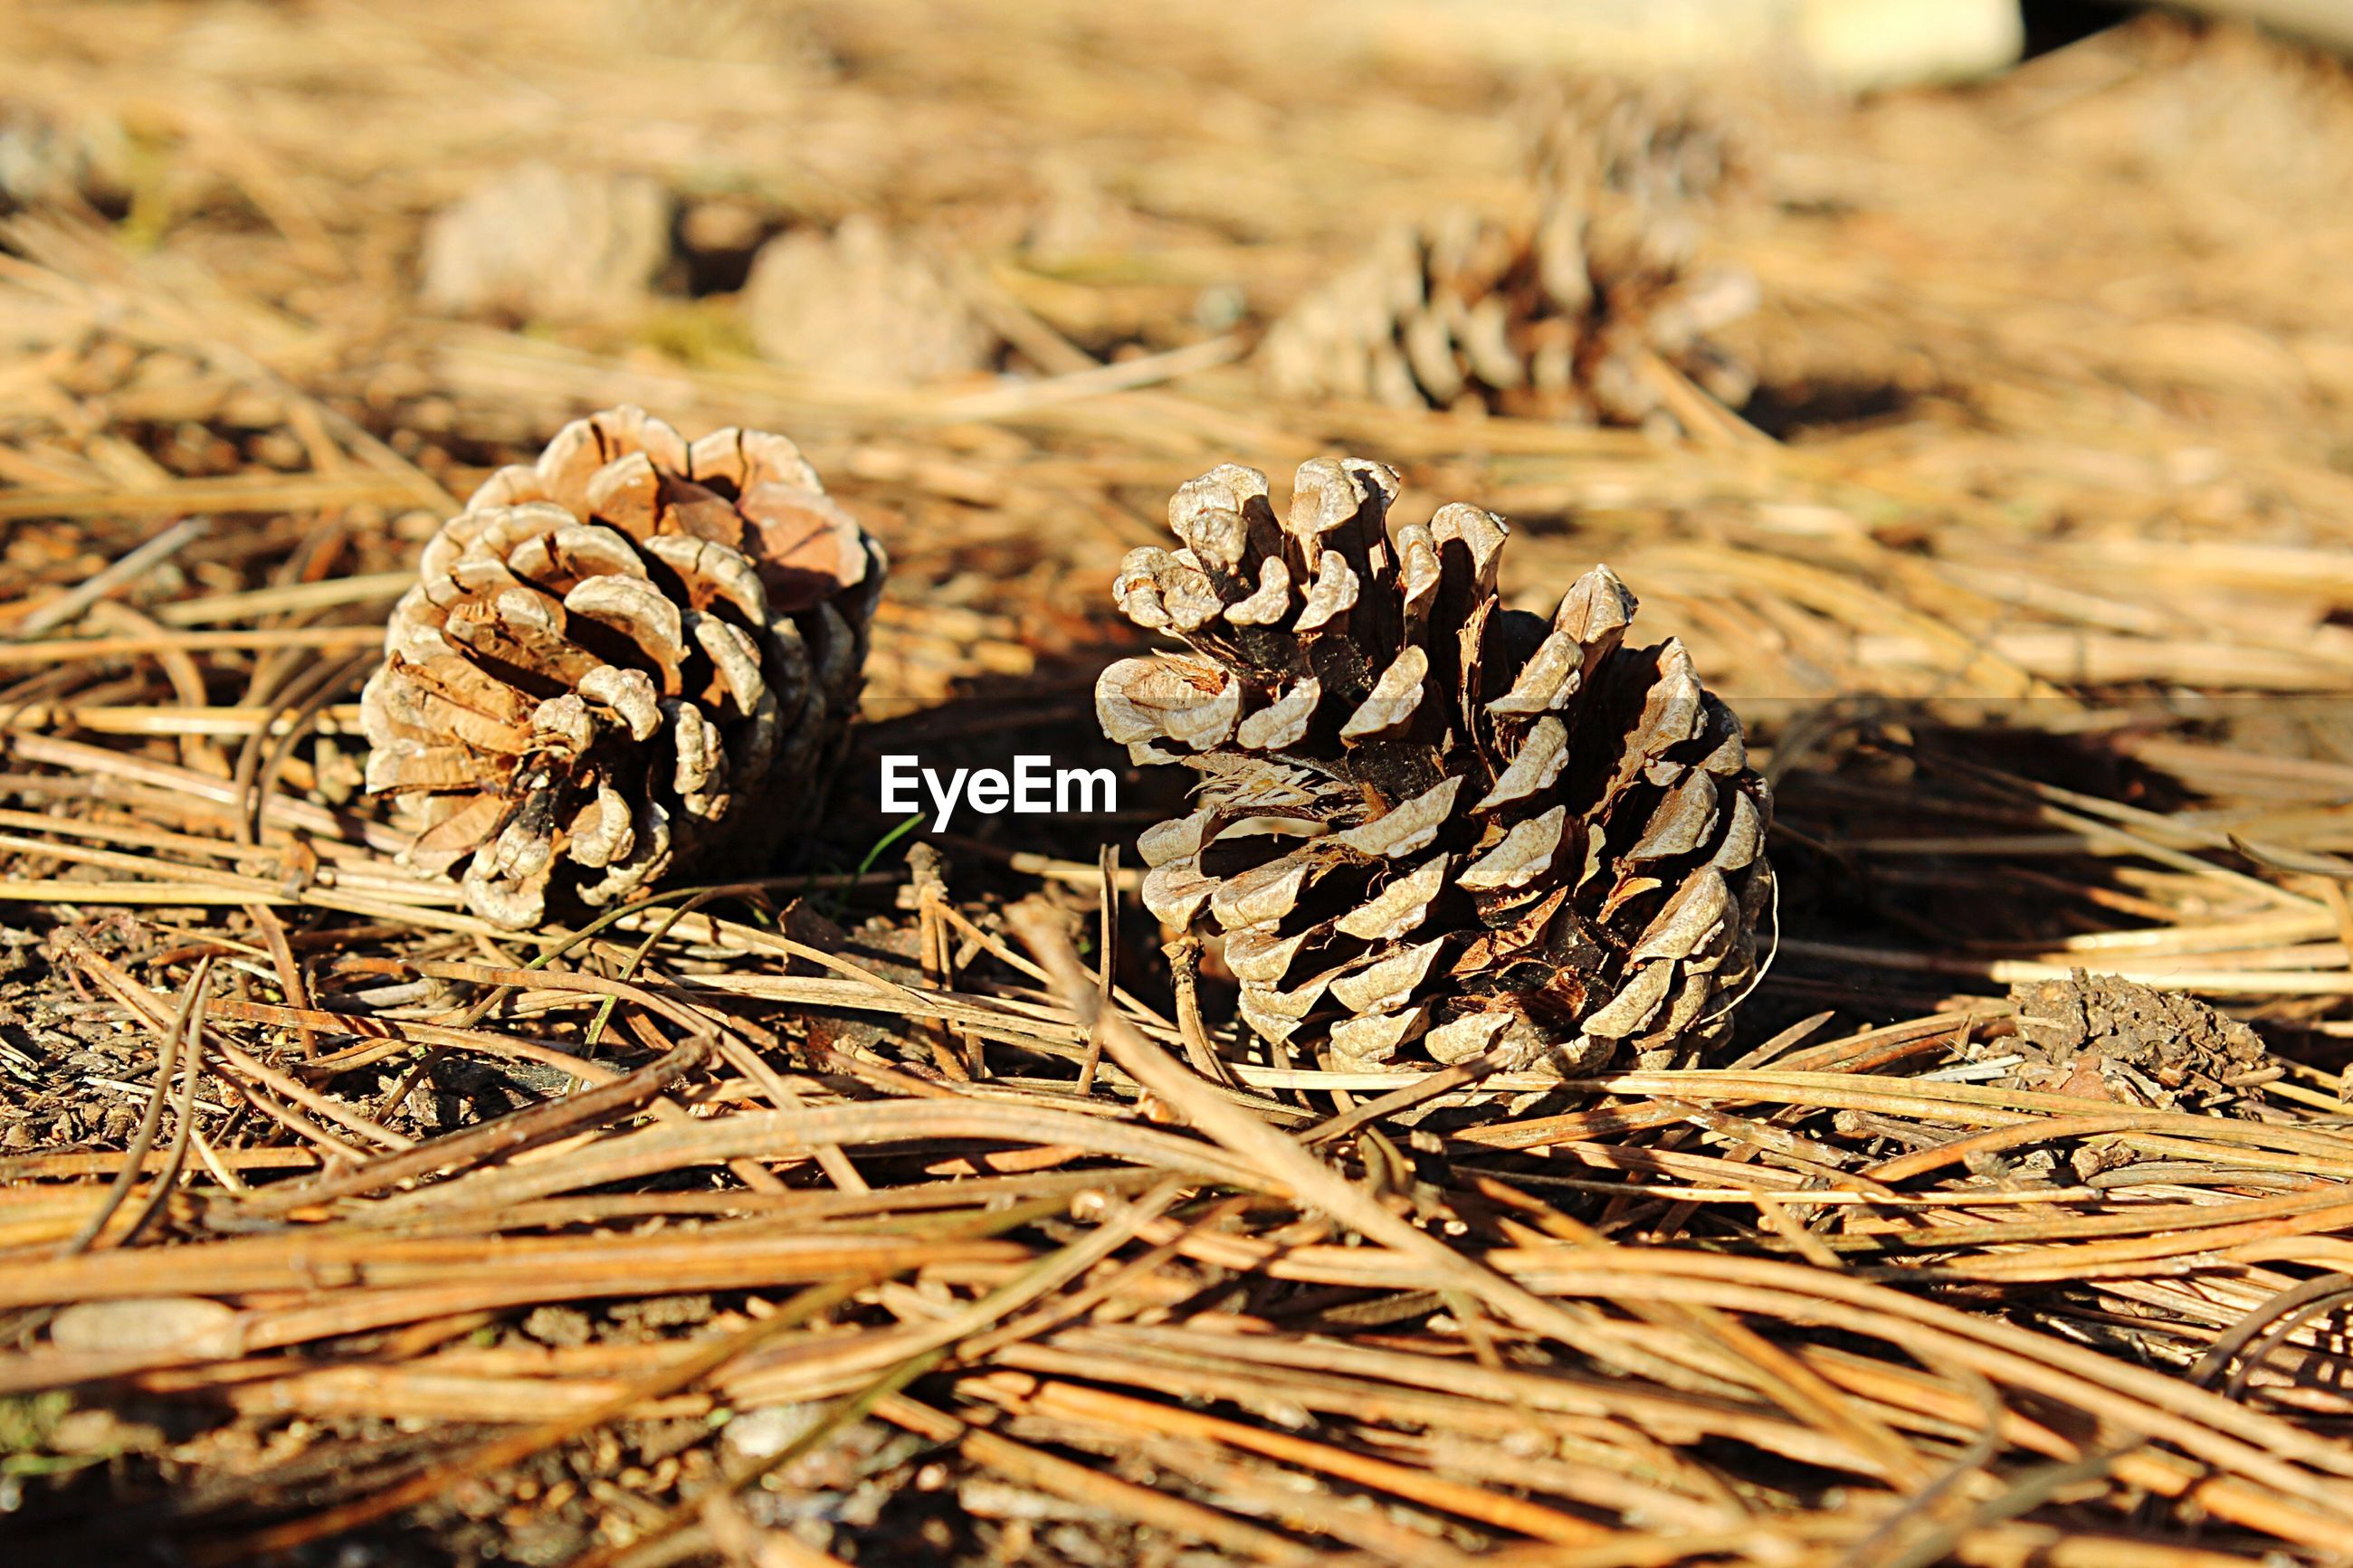 Close-up of fallen pine cones on sticks